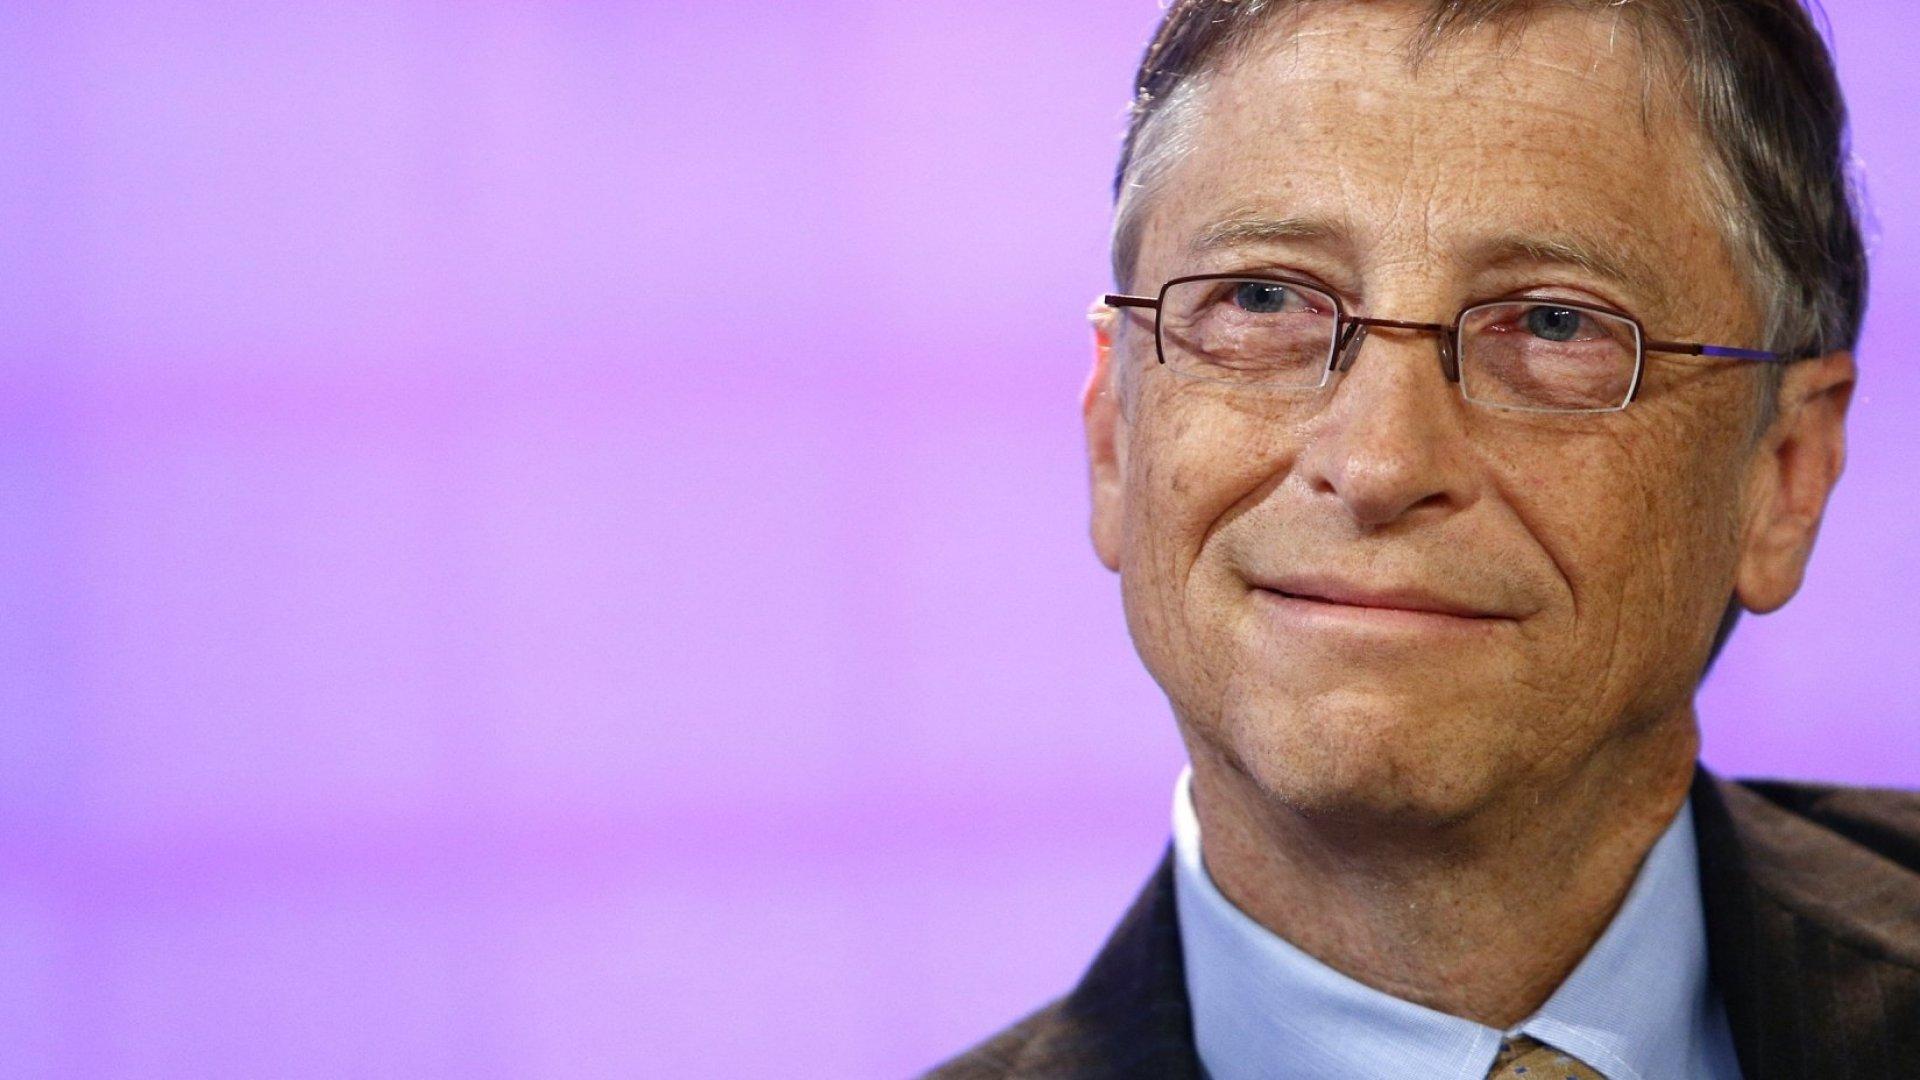 The 1 Thing That Made Steve Jobs, Warren Buffett, and Bill Gates So Successful